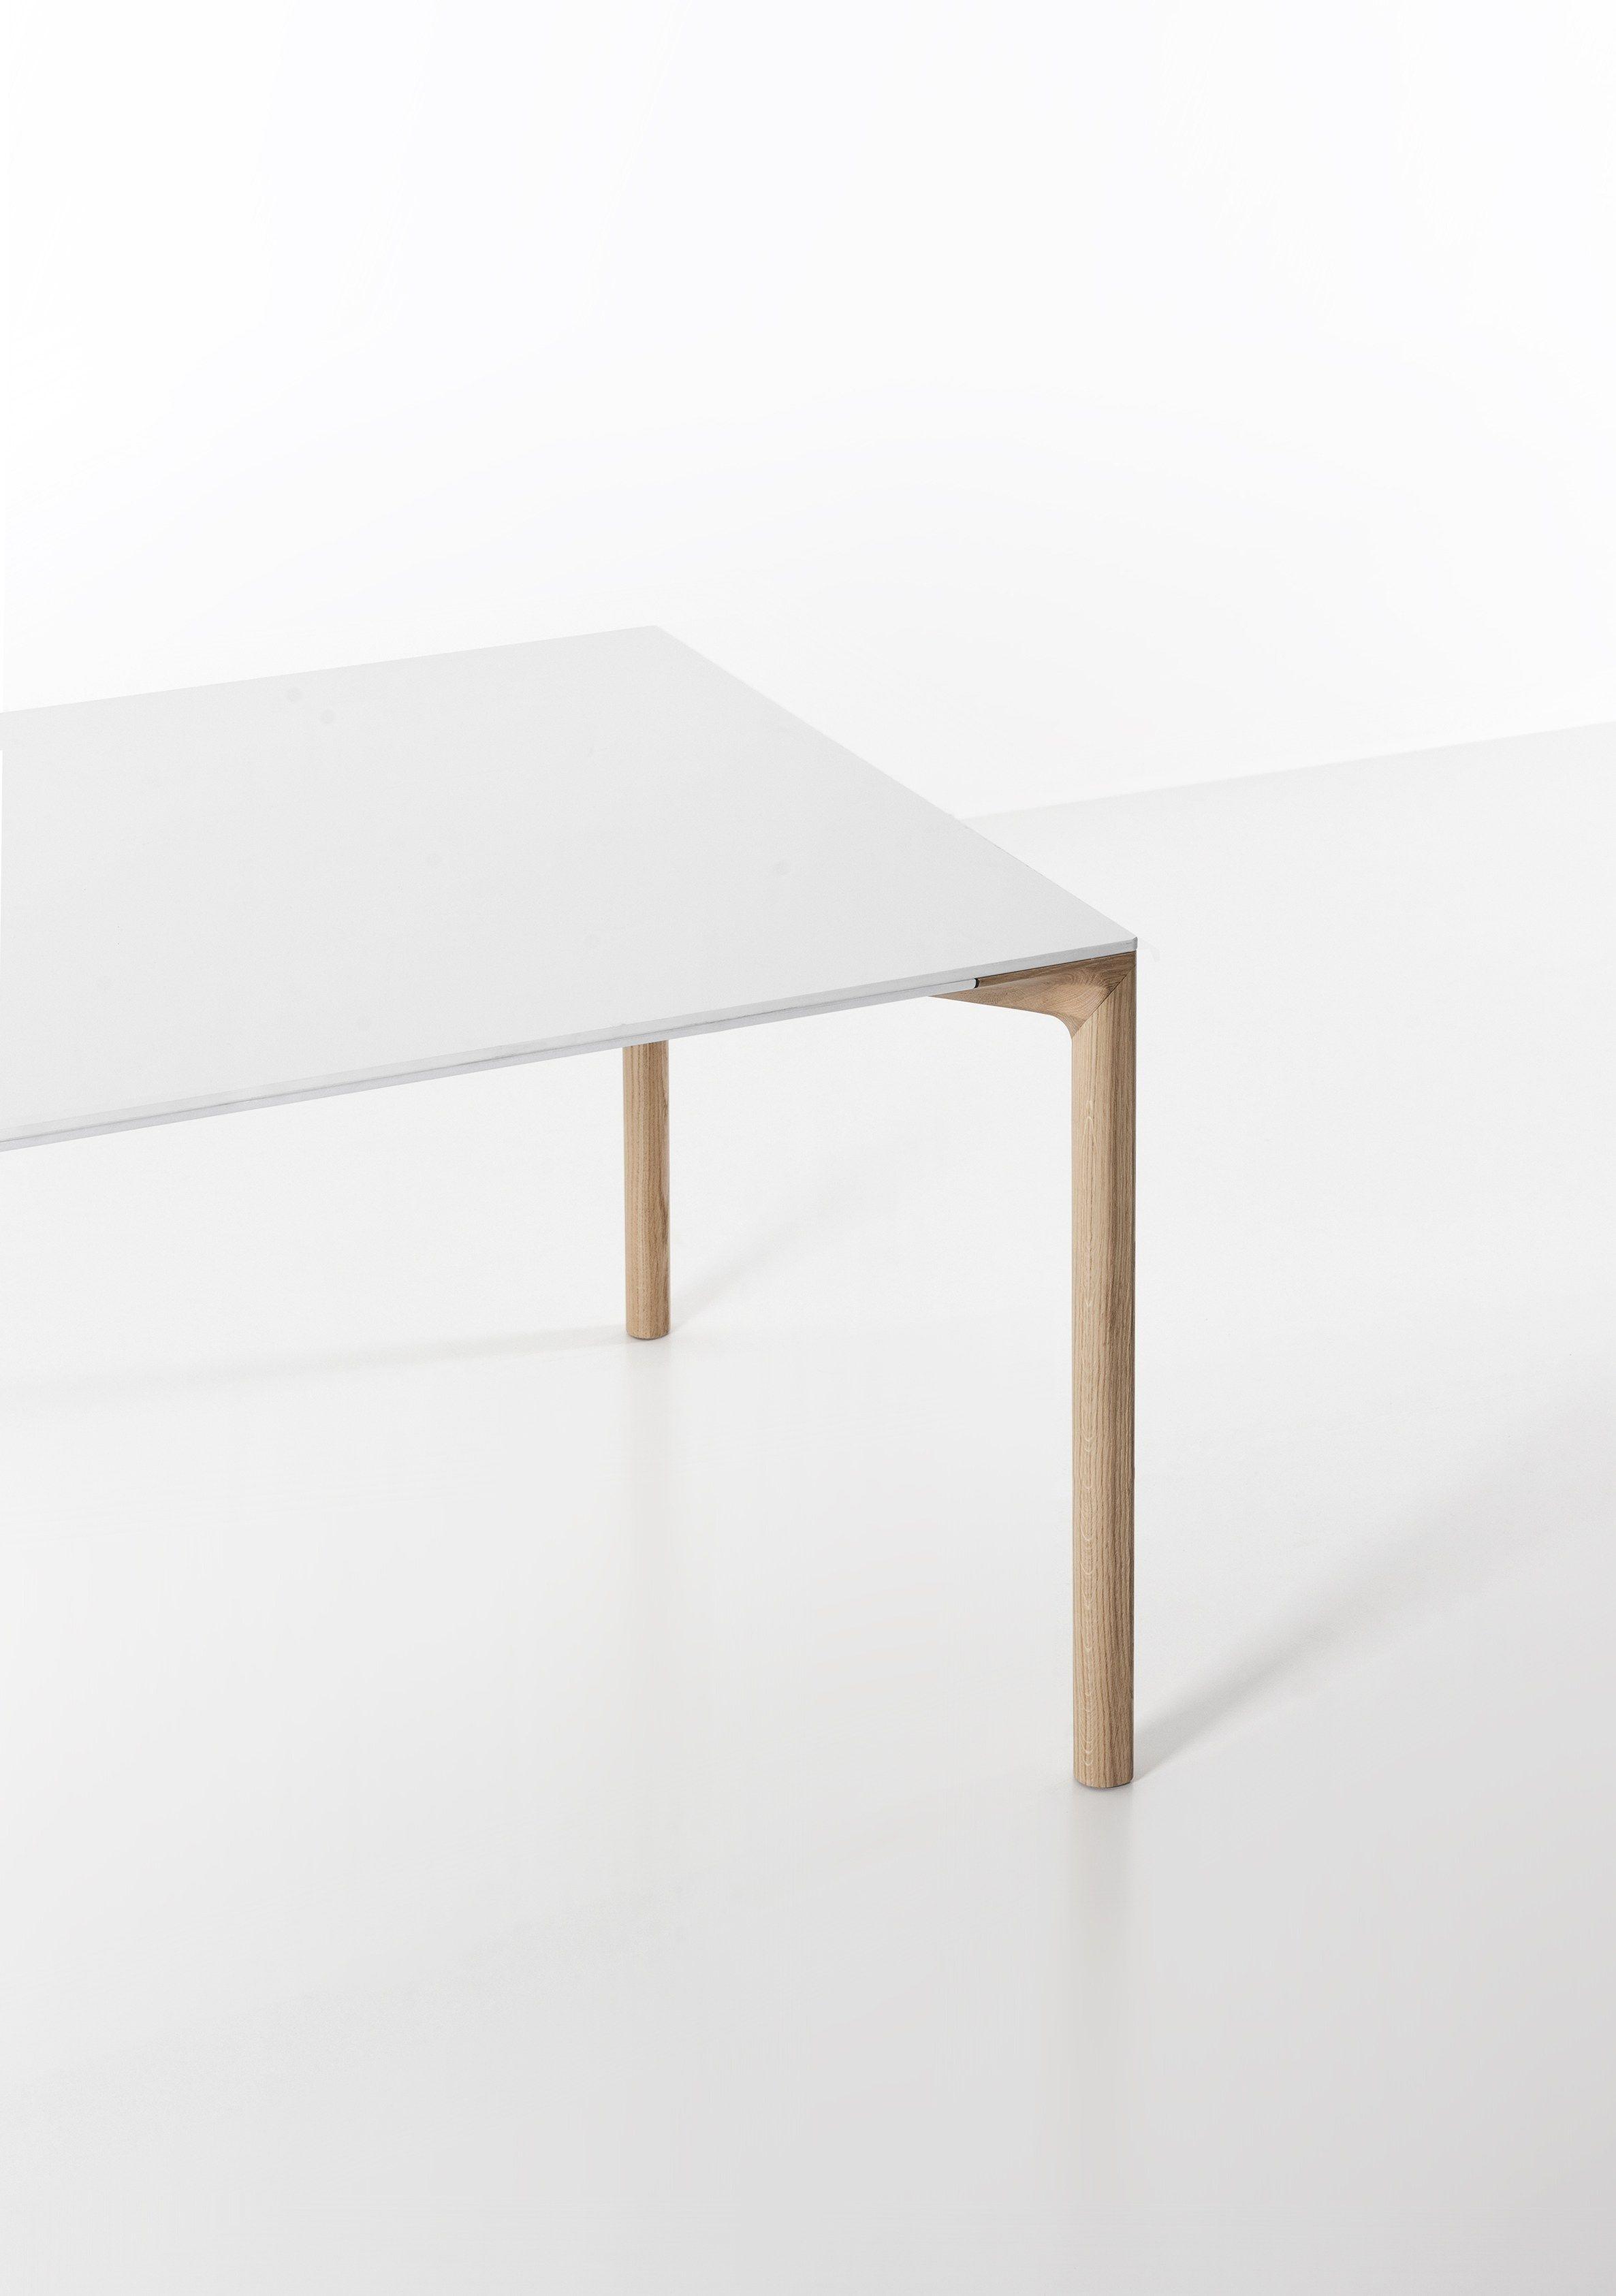 Rechteckiger tisch boiacca wood by kristalia design for Tisch design wood